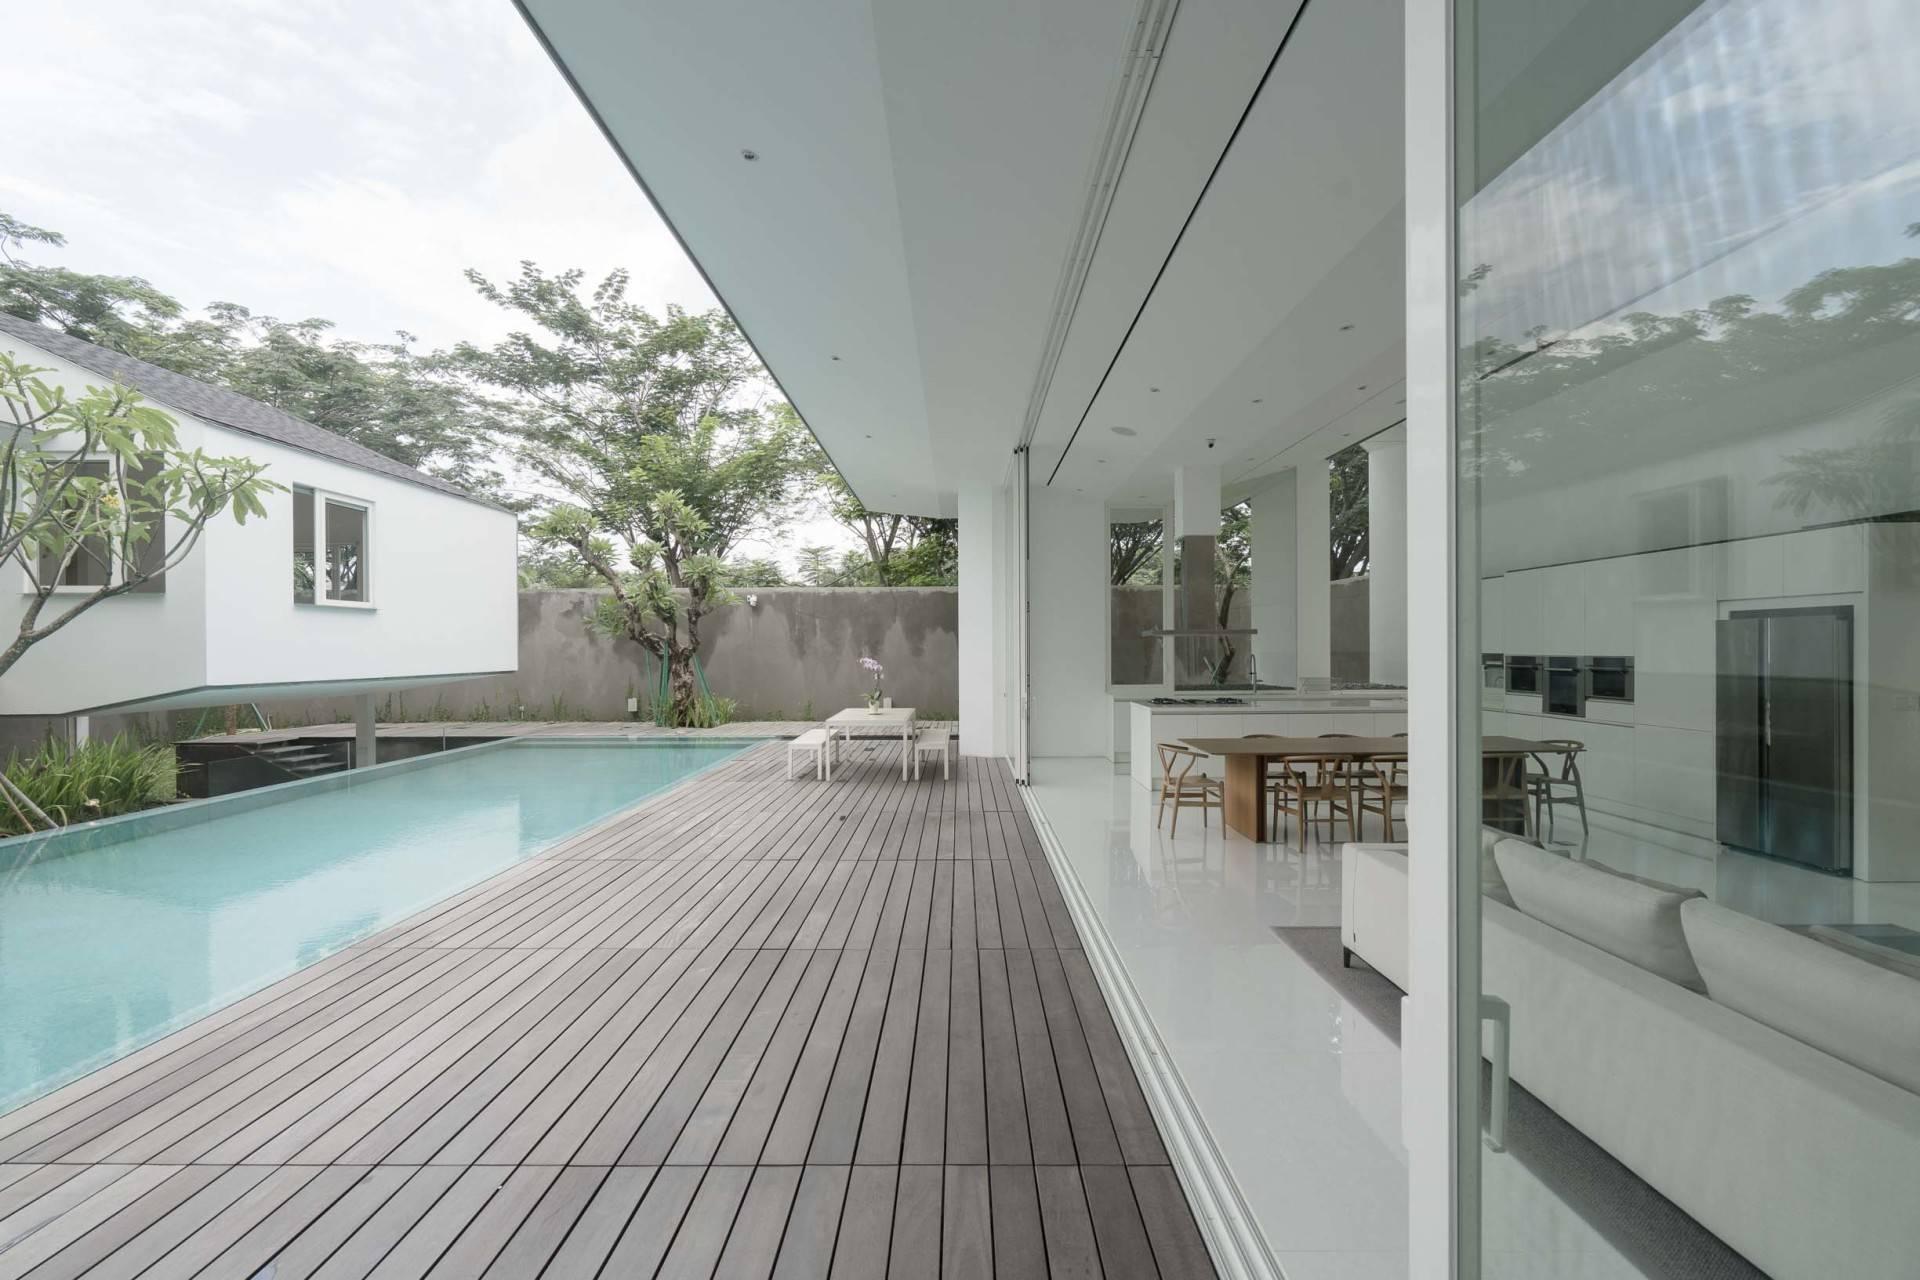 Antony Liu + Ferry Ridwan / Studio Tonton Is House Tangerang Tangerang Swimming Pool Area Modern  8176